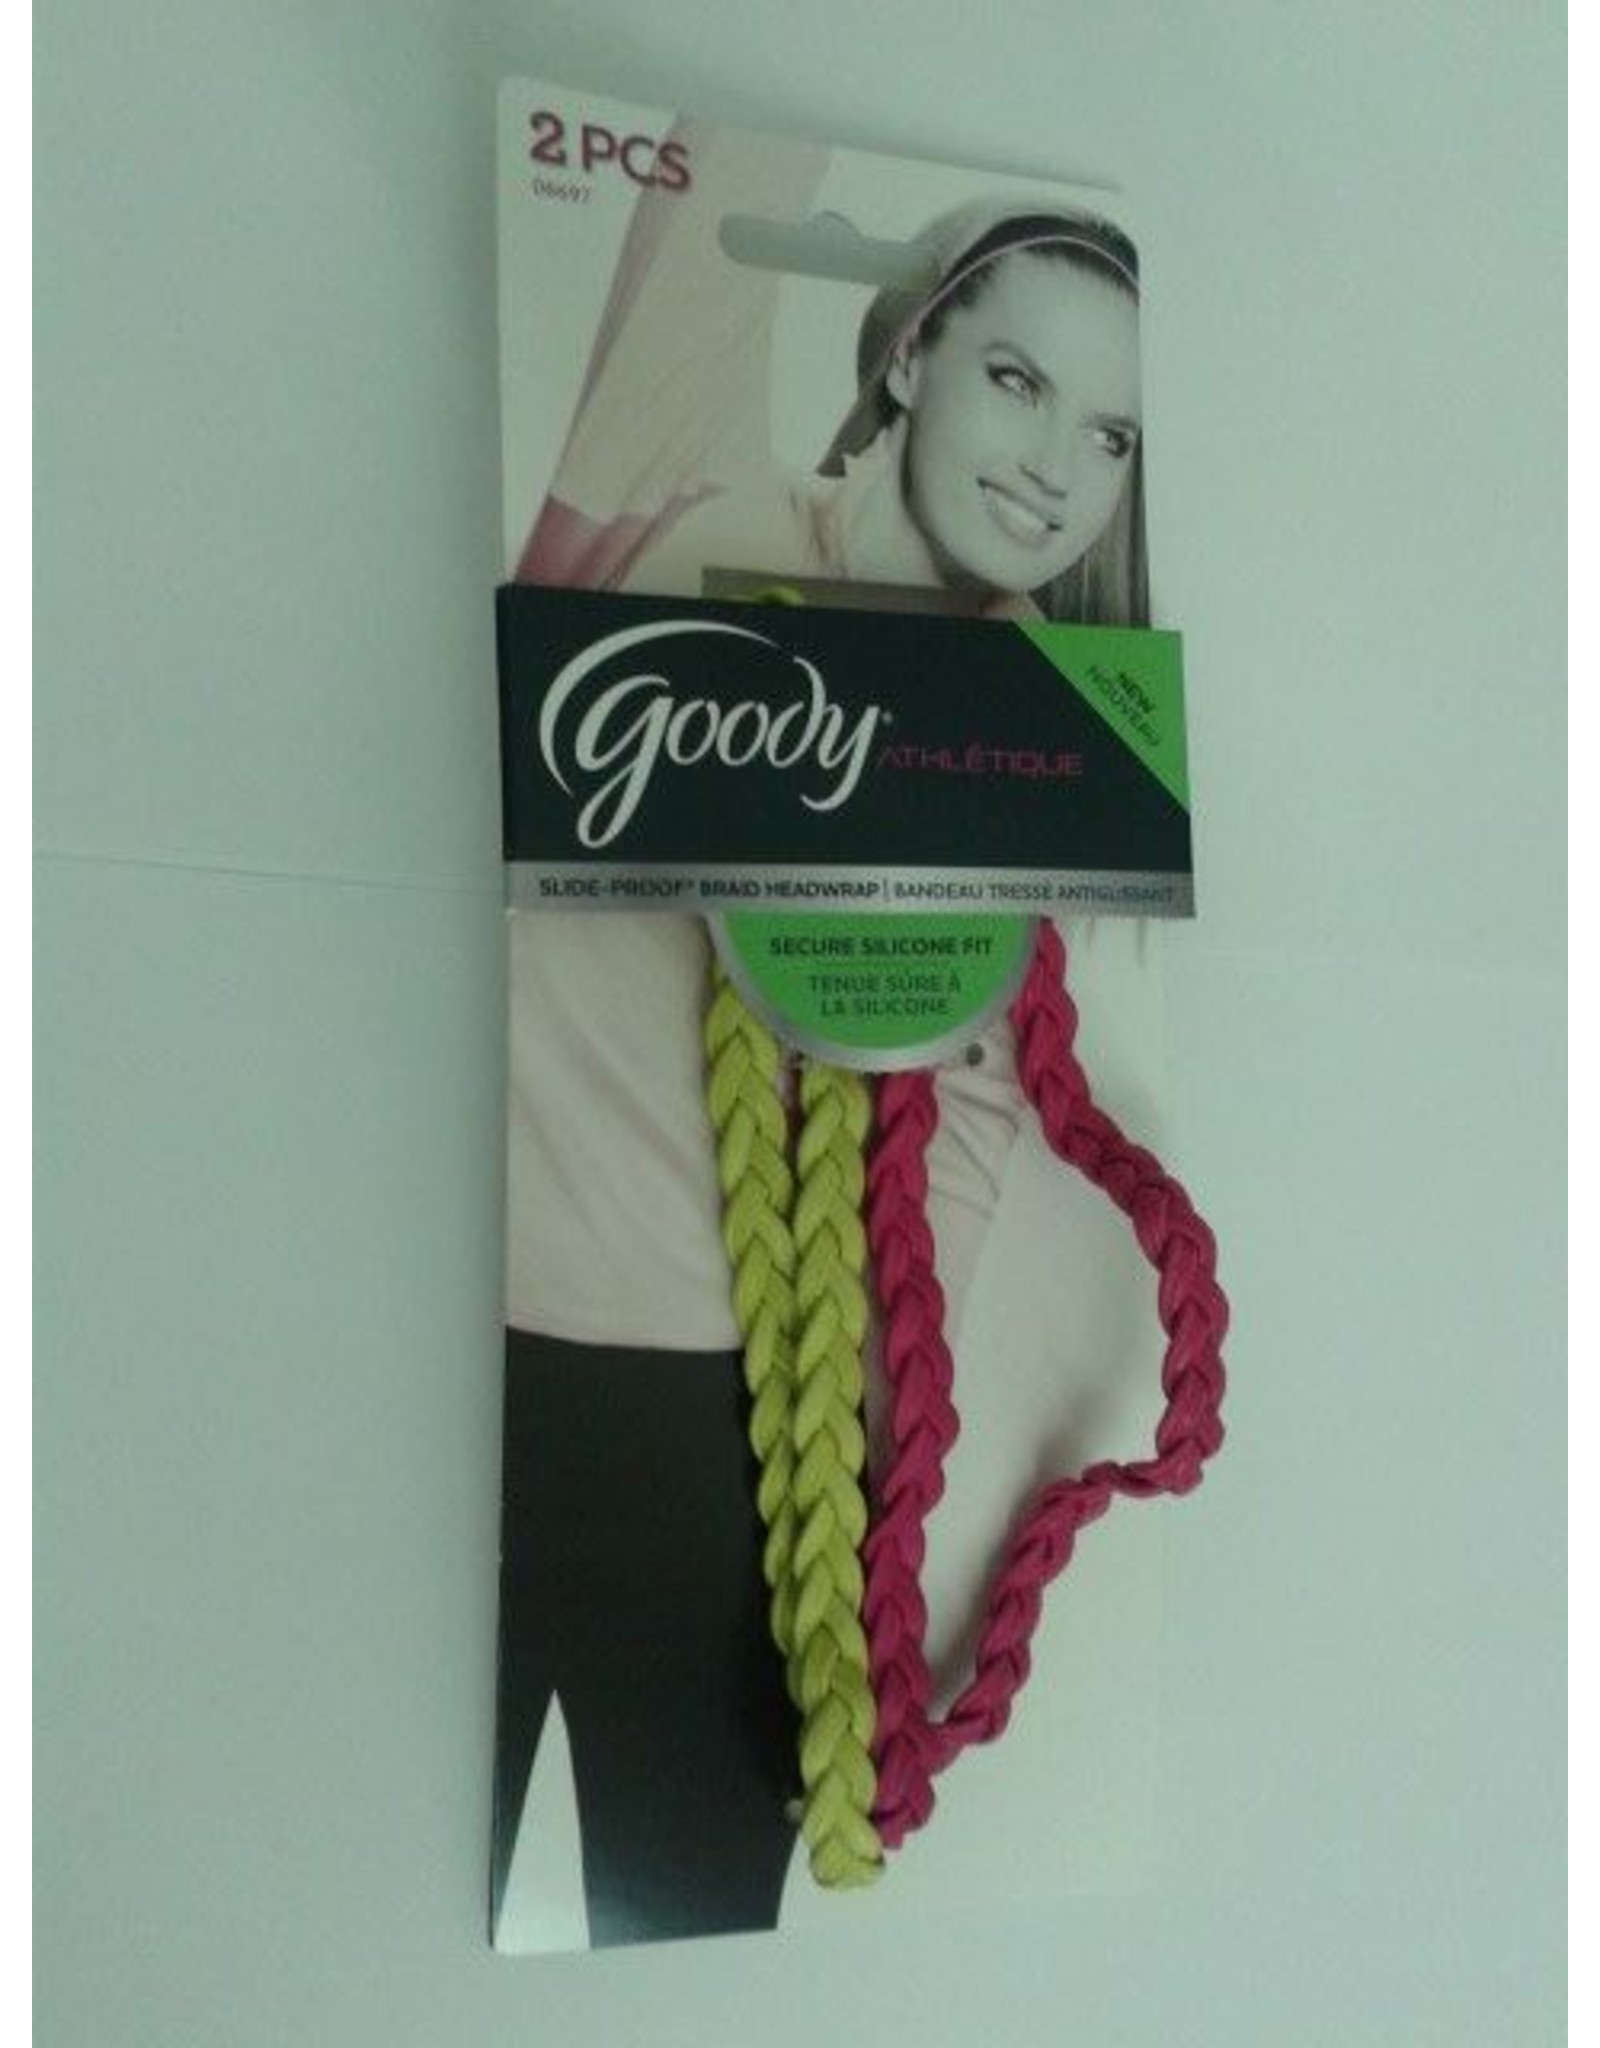 Goody Headwrap Slide Proof Braid Pink, Yellow